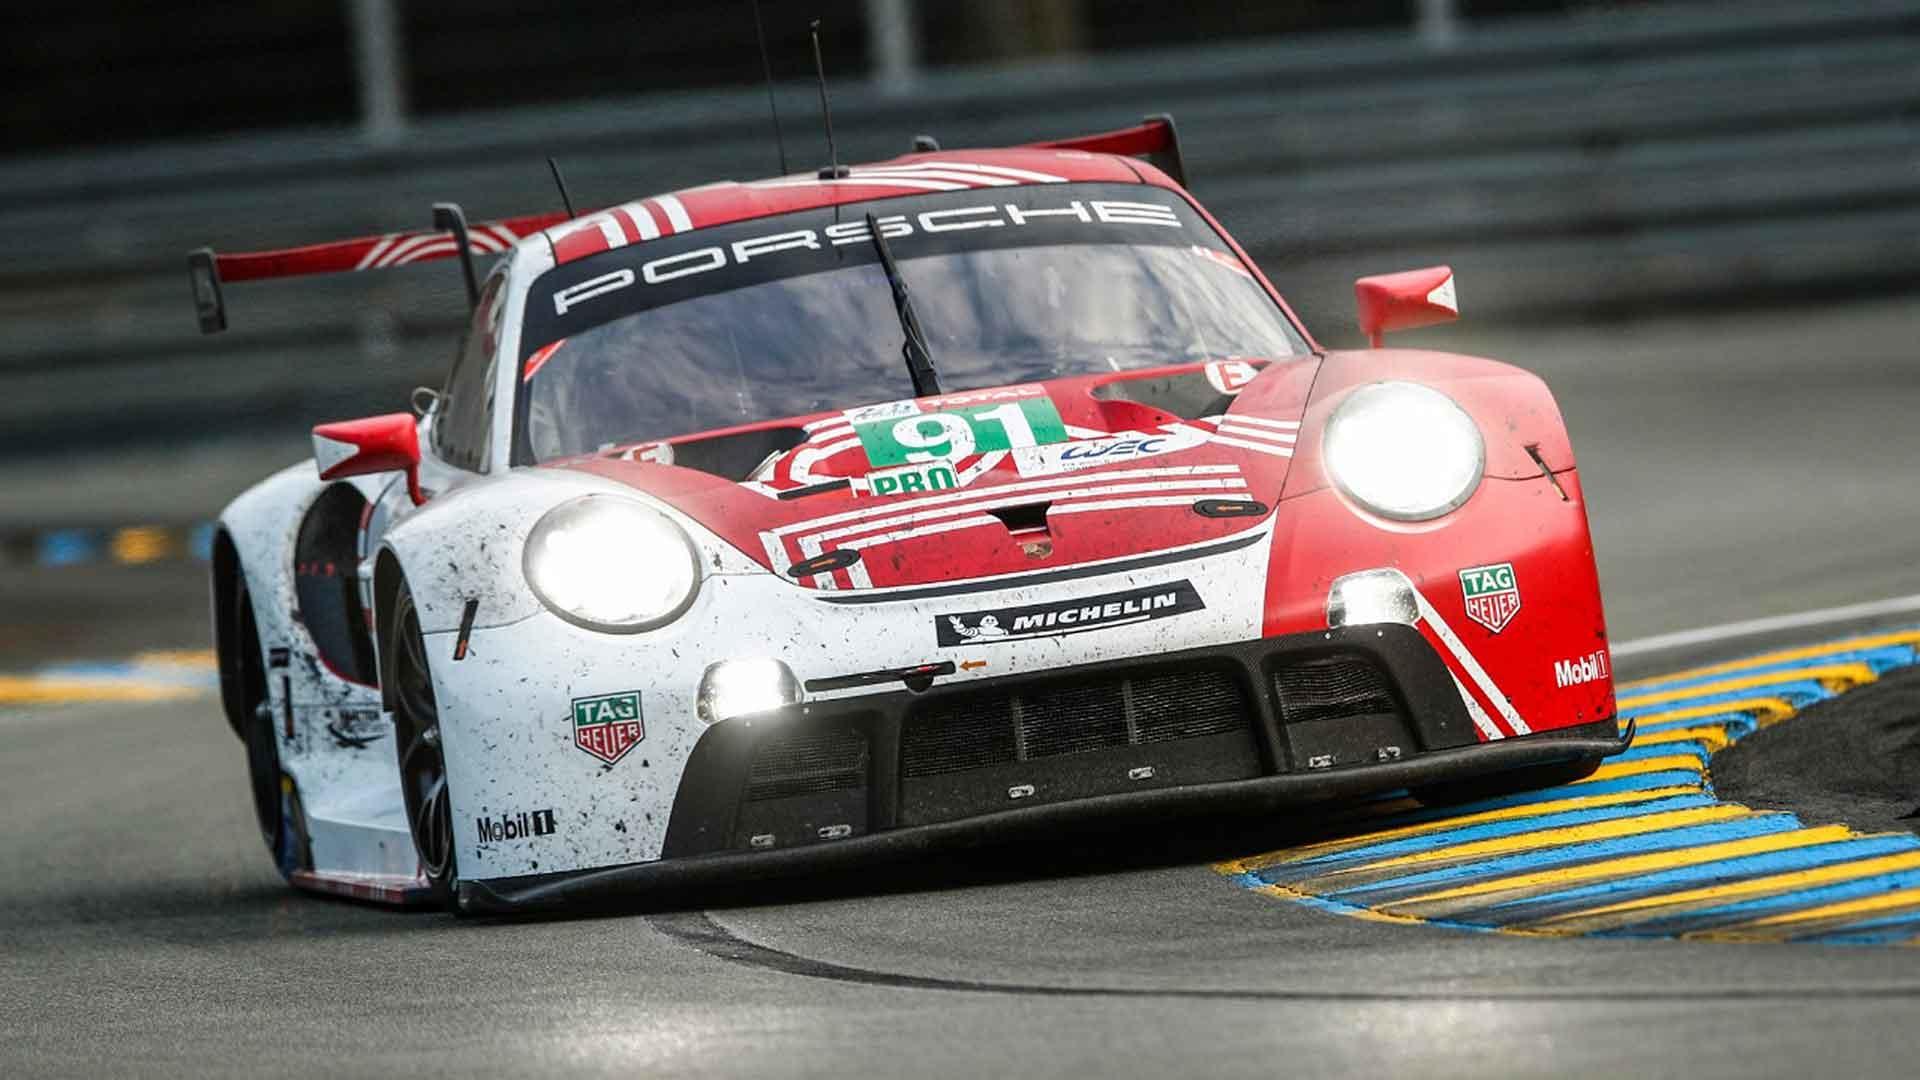 Porsche 911 racing at the 2020 Le Mans 24 Hours